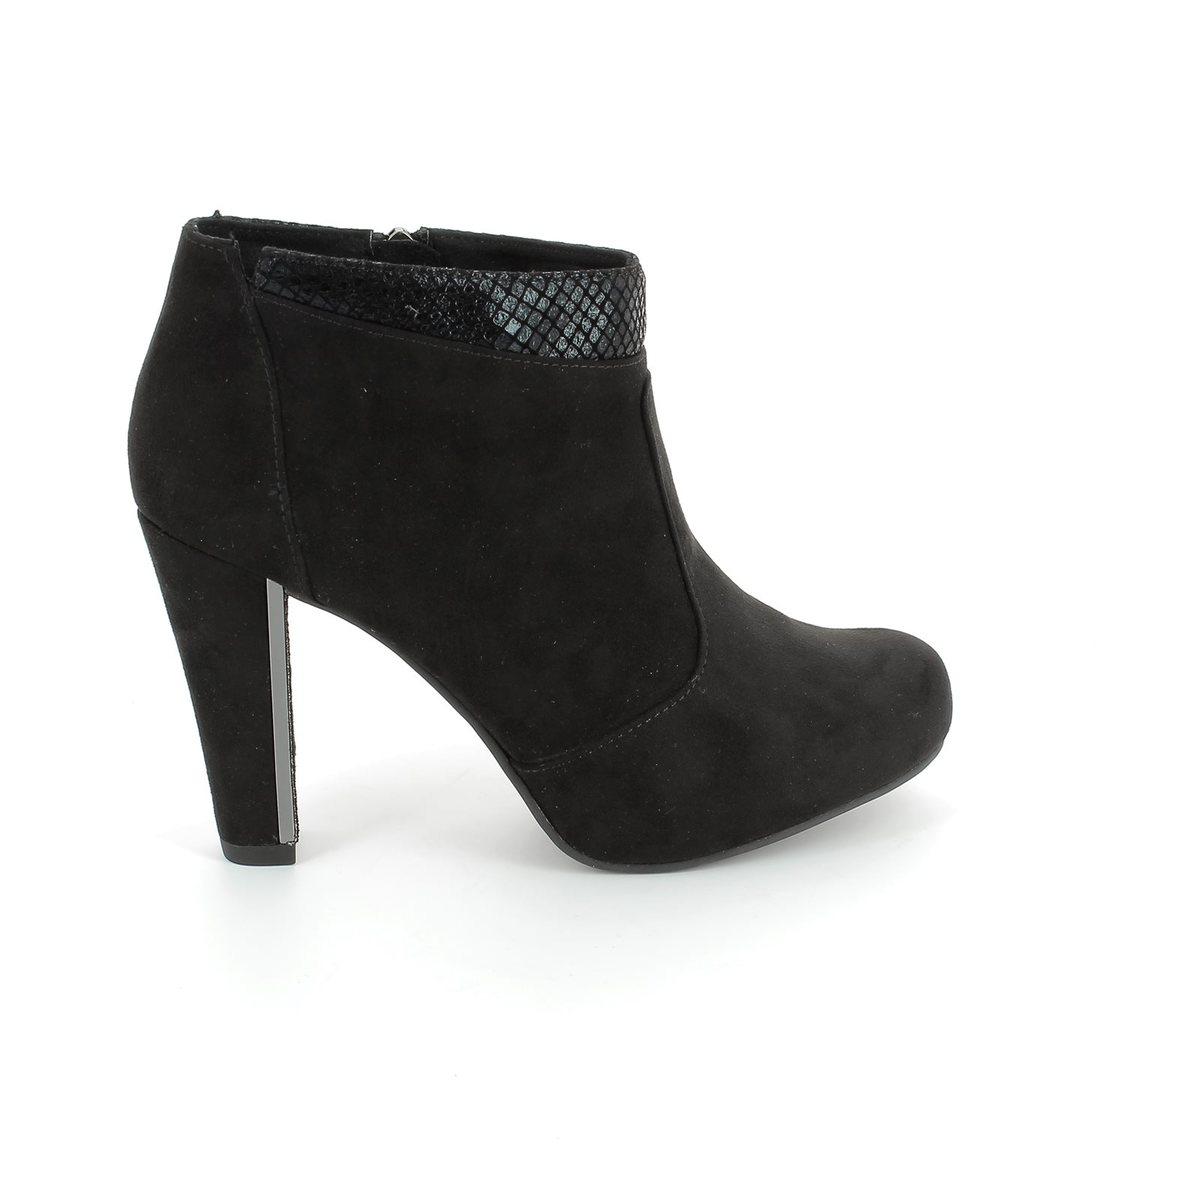 tamaris carradank 25052 052 black suede ankle boots. Black Bedroom Furniture Sets. Home Design Ideas